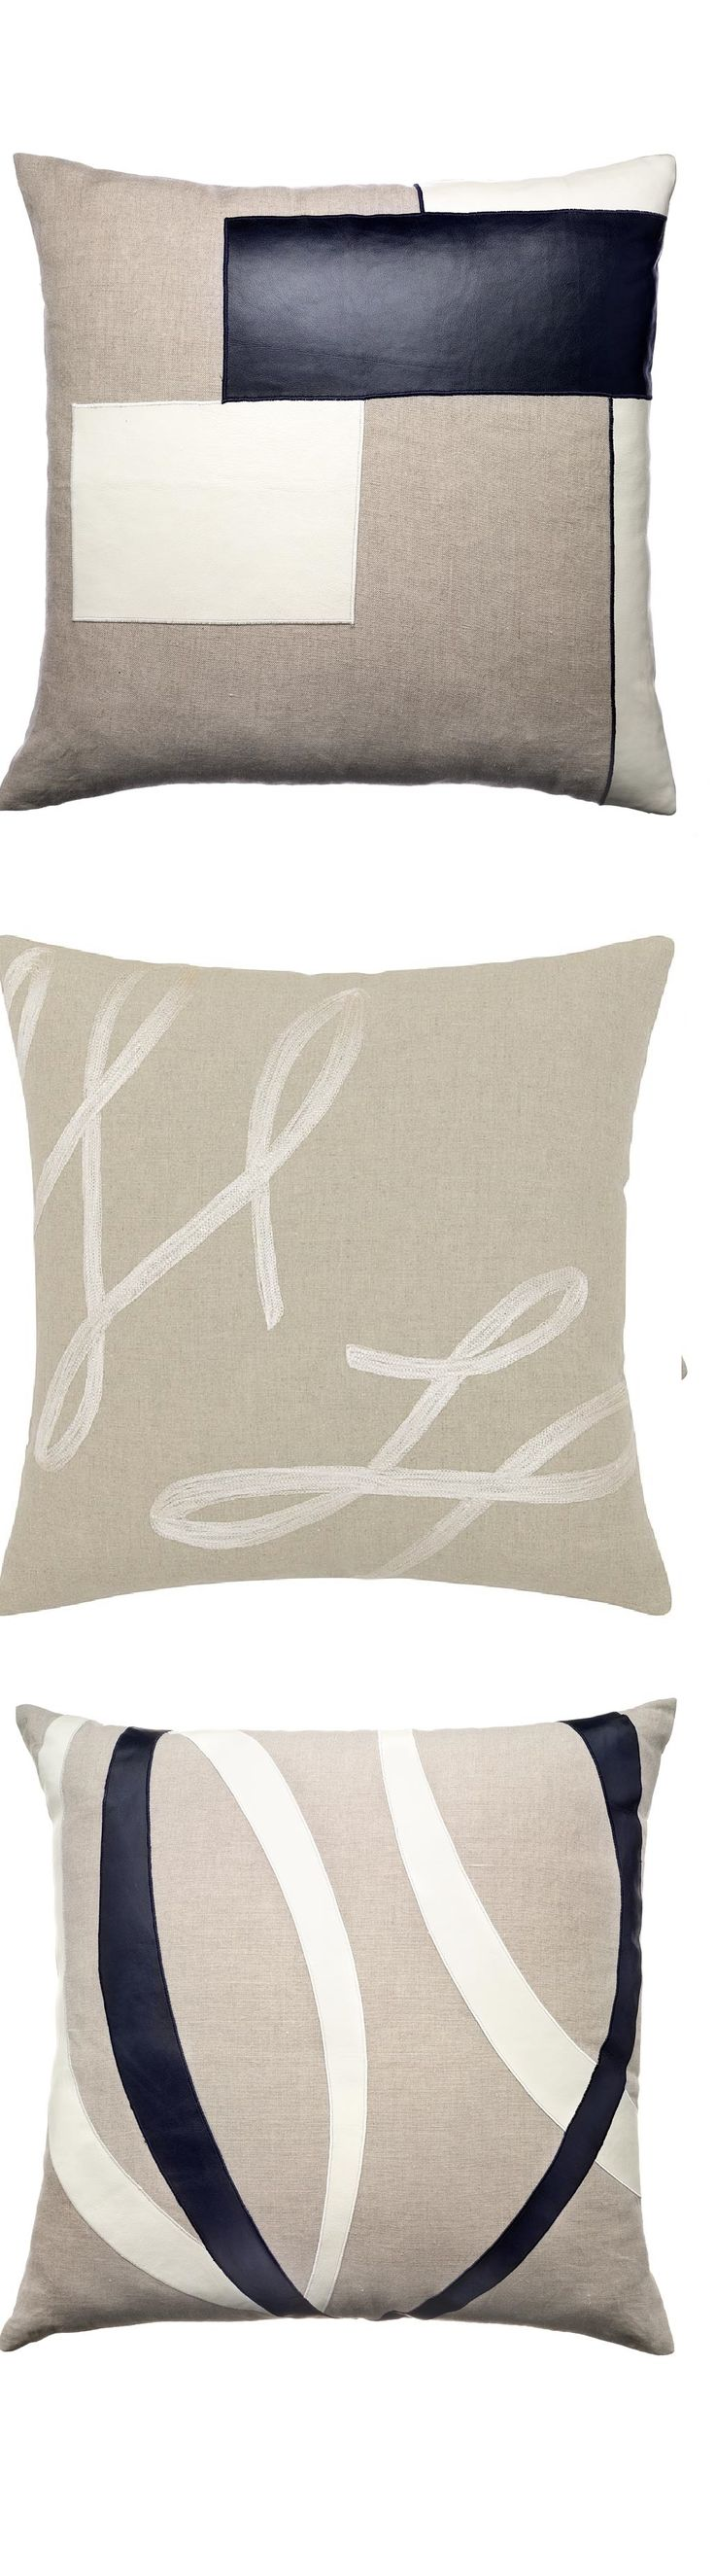 Best 25 Contemporary pillow cases ideas on Pinterest